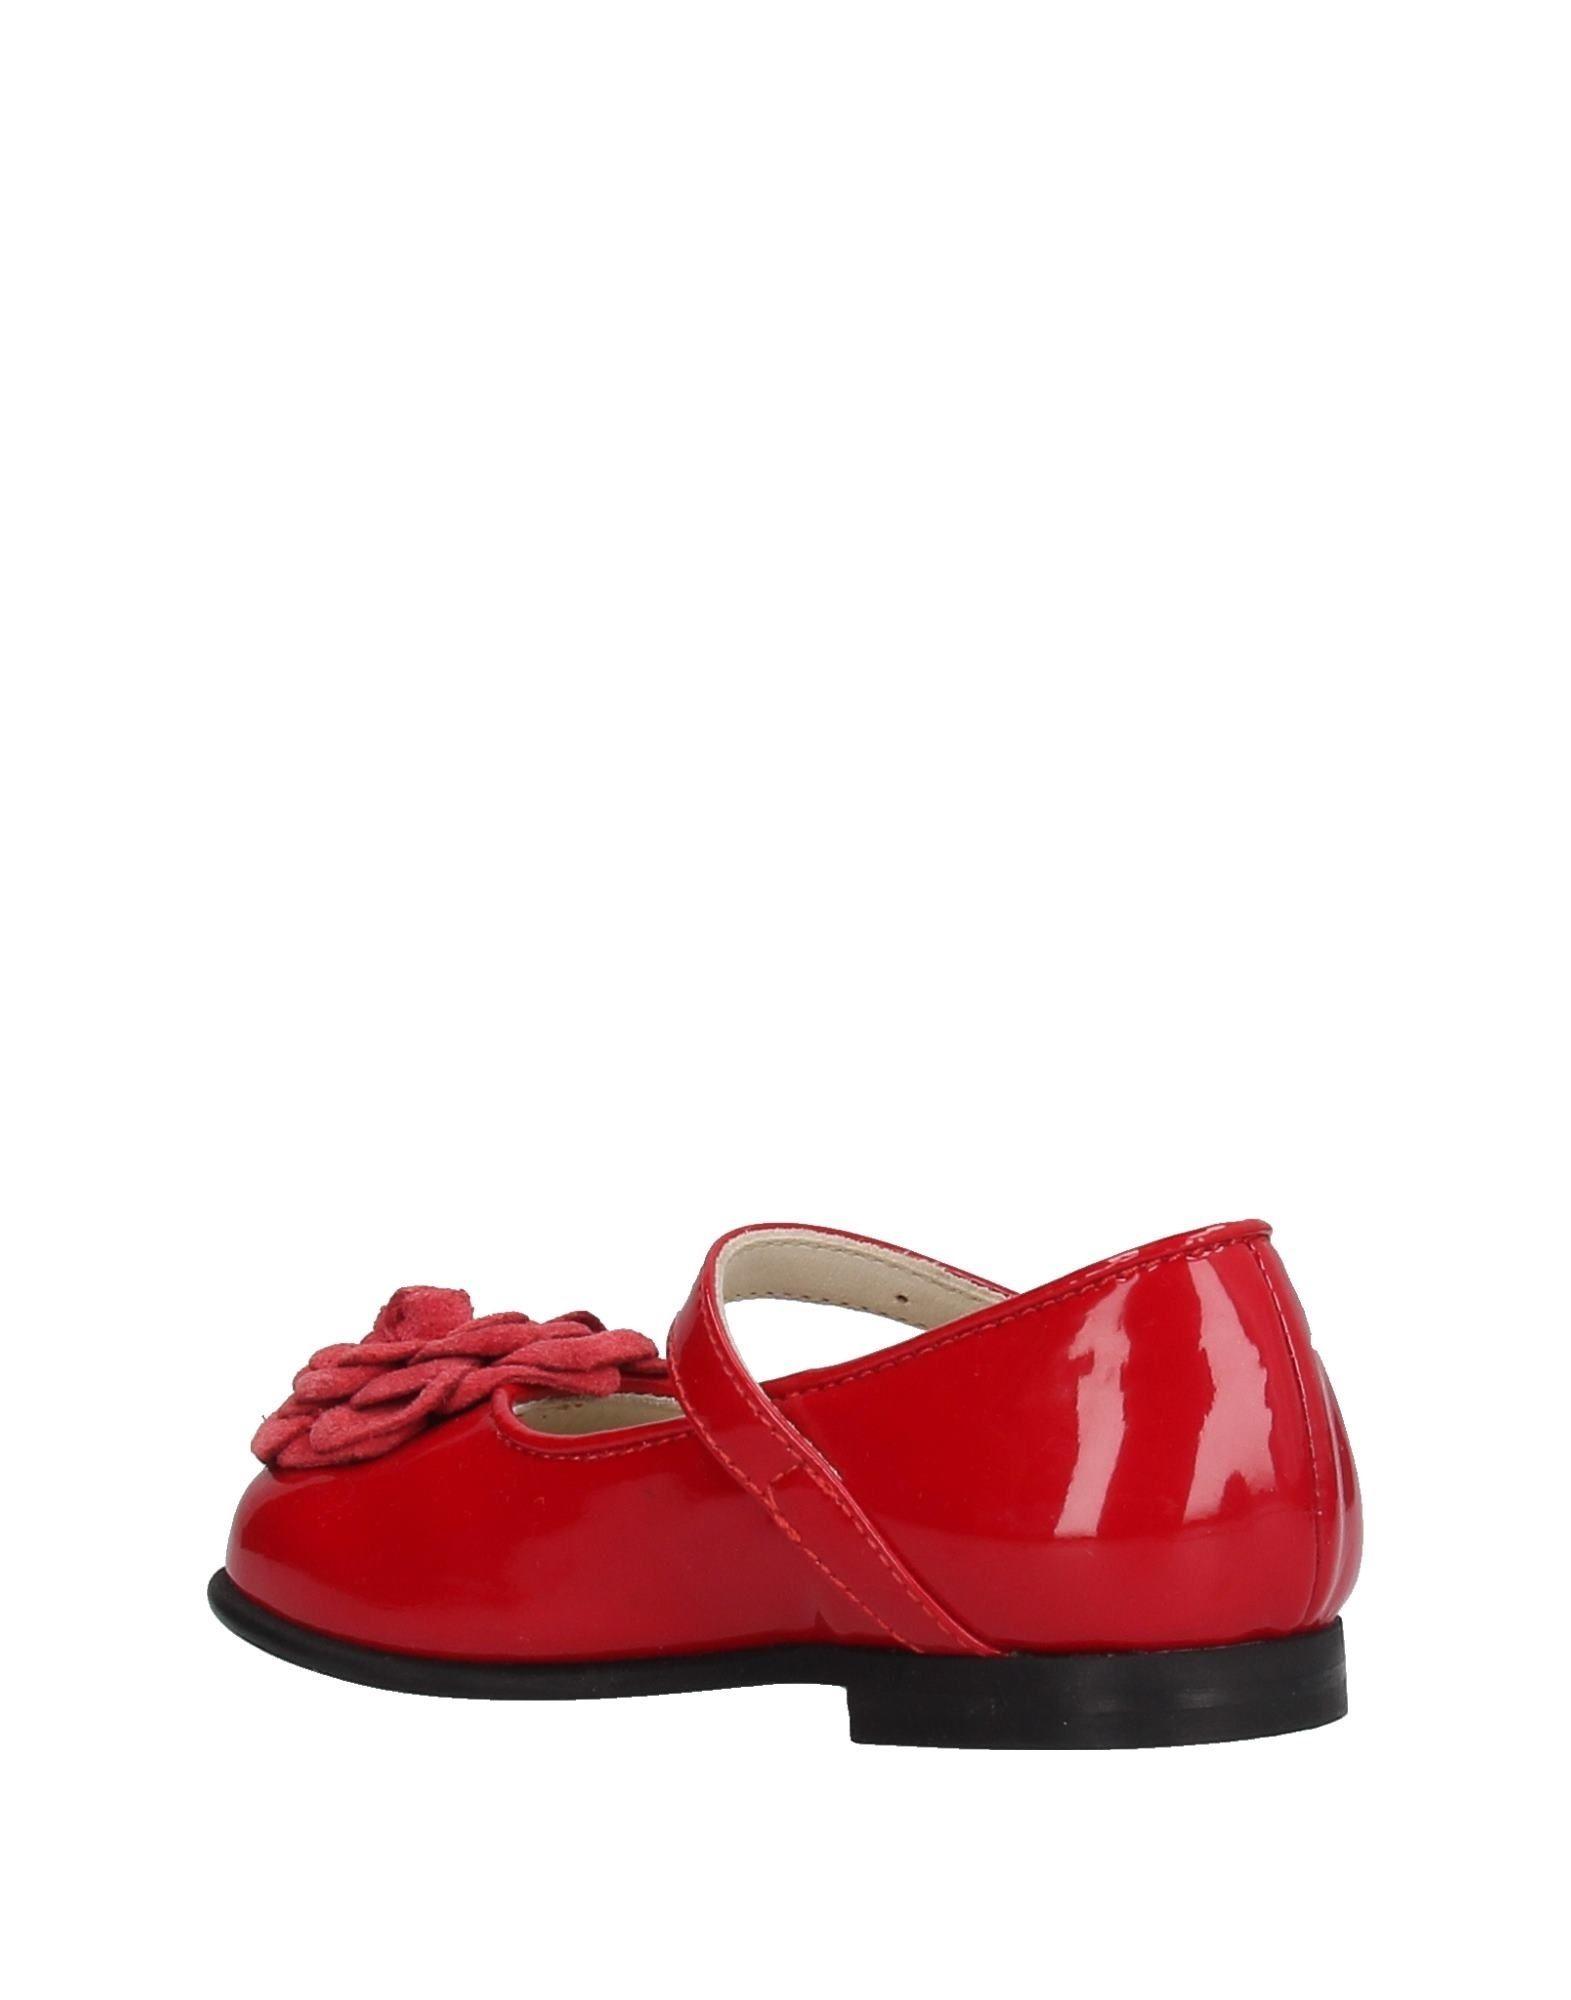 FOOTWEAR Armani Junior Red Girl Bovine